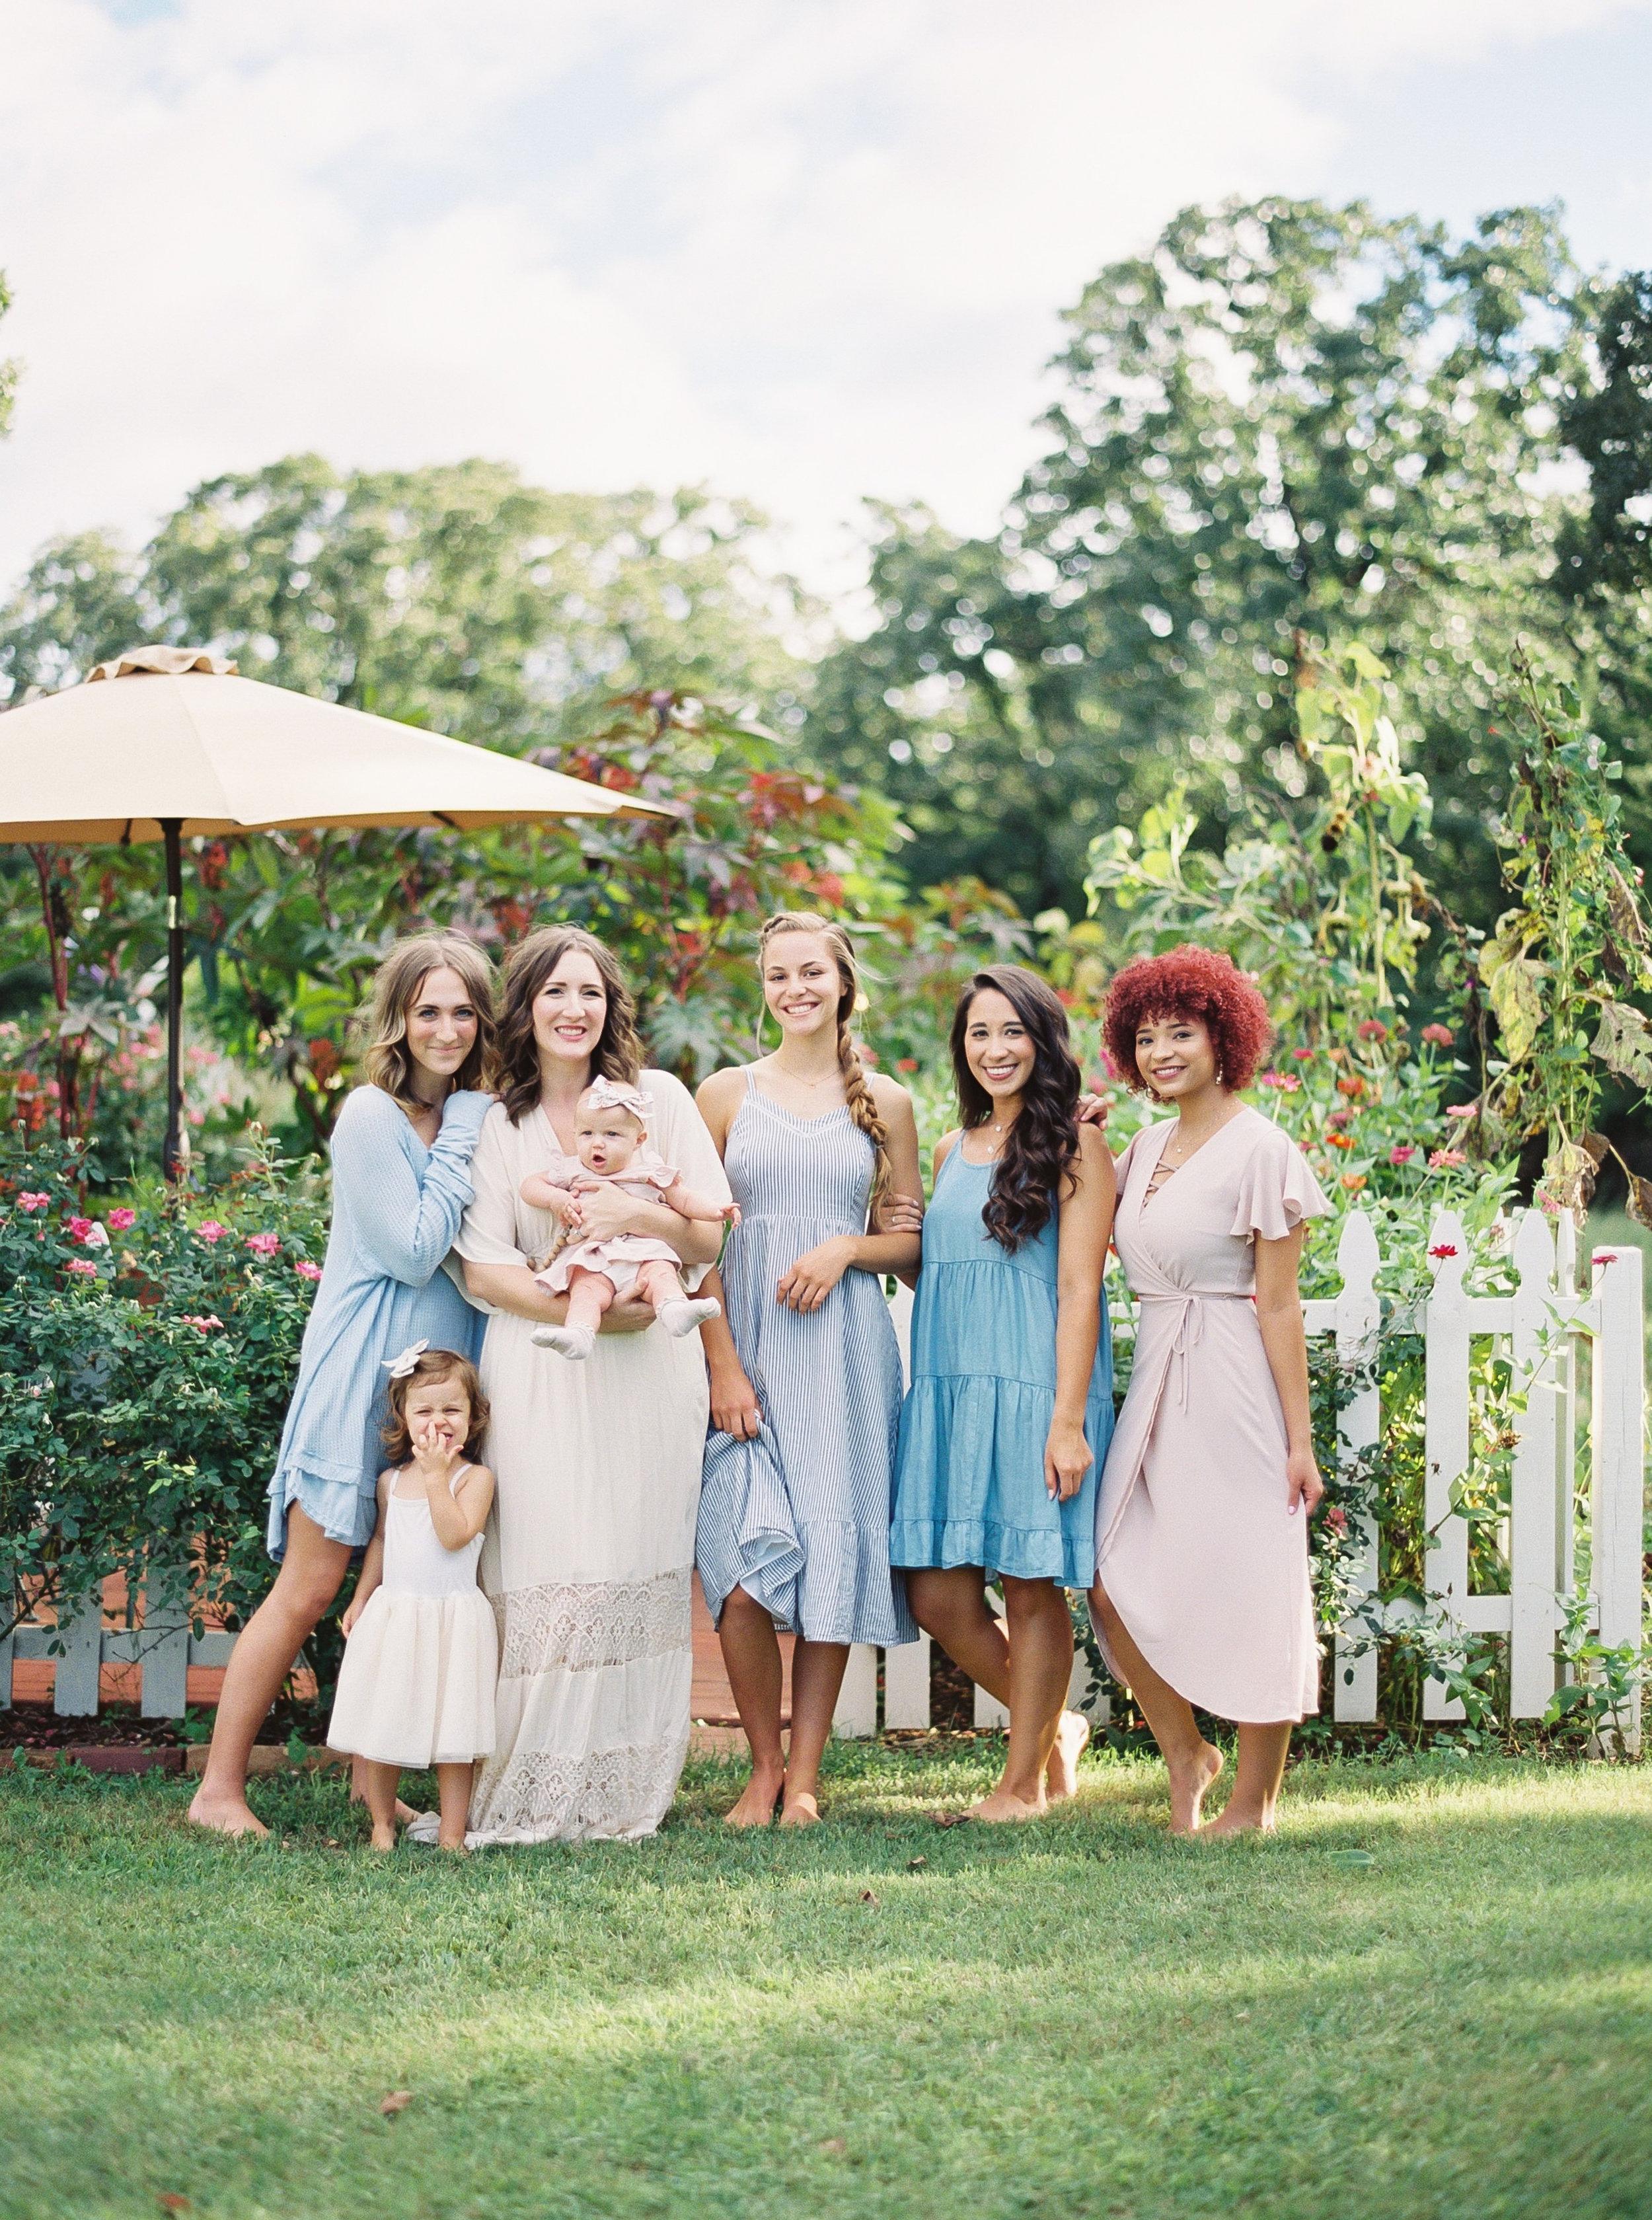 Models: Courtney Ramsey, Kaleigh Bishop, Sasha LeBlanc, Taylor Marie, and Hosanna Morris